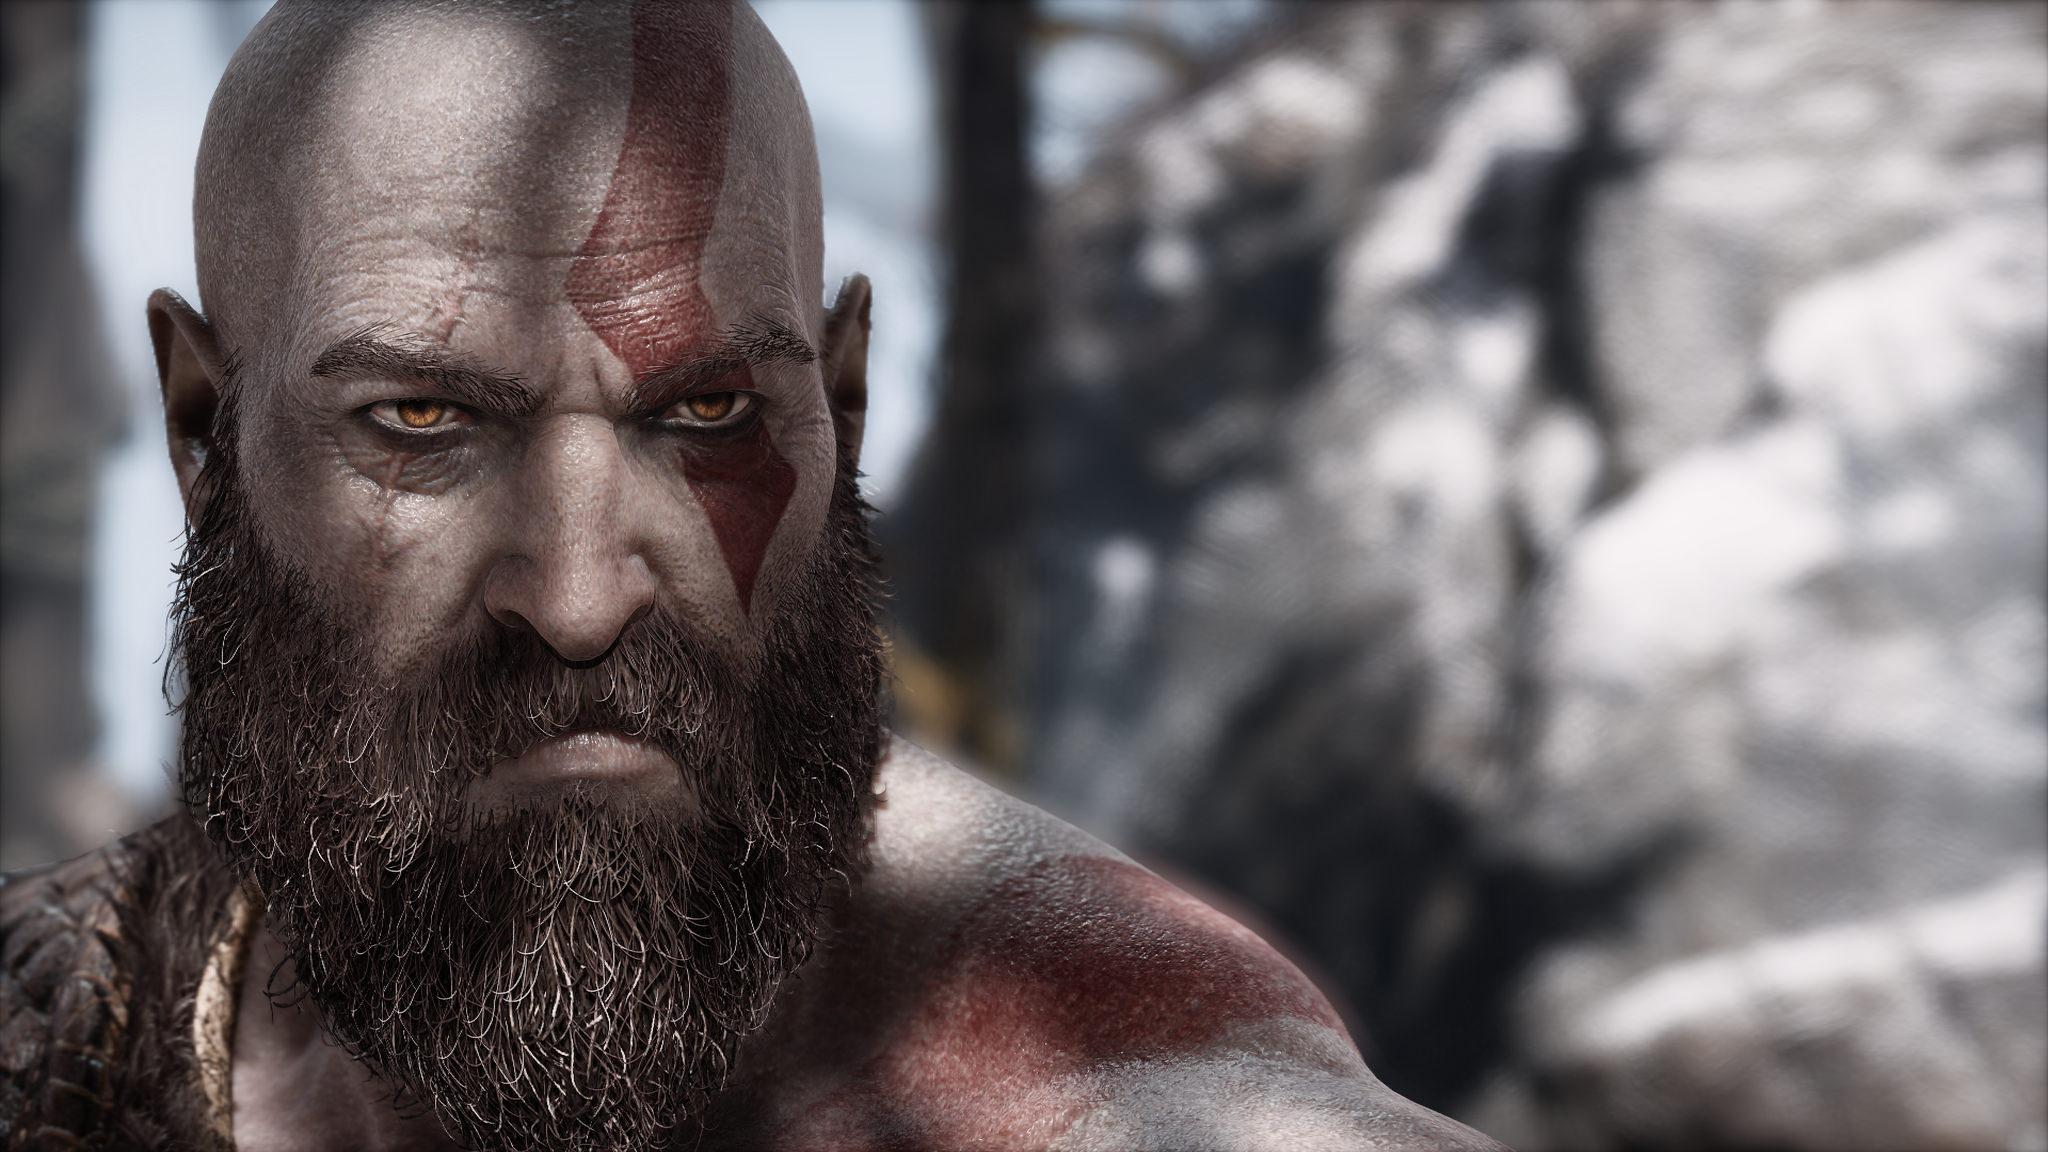 960x540 Kratos God Of War 4 Video Game 960x540 Resolution Hd